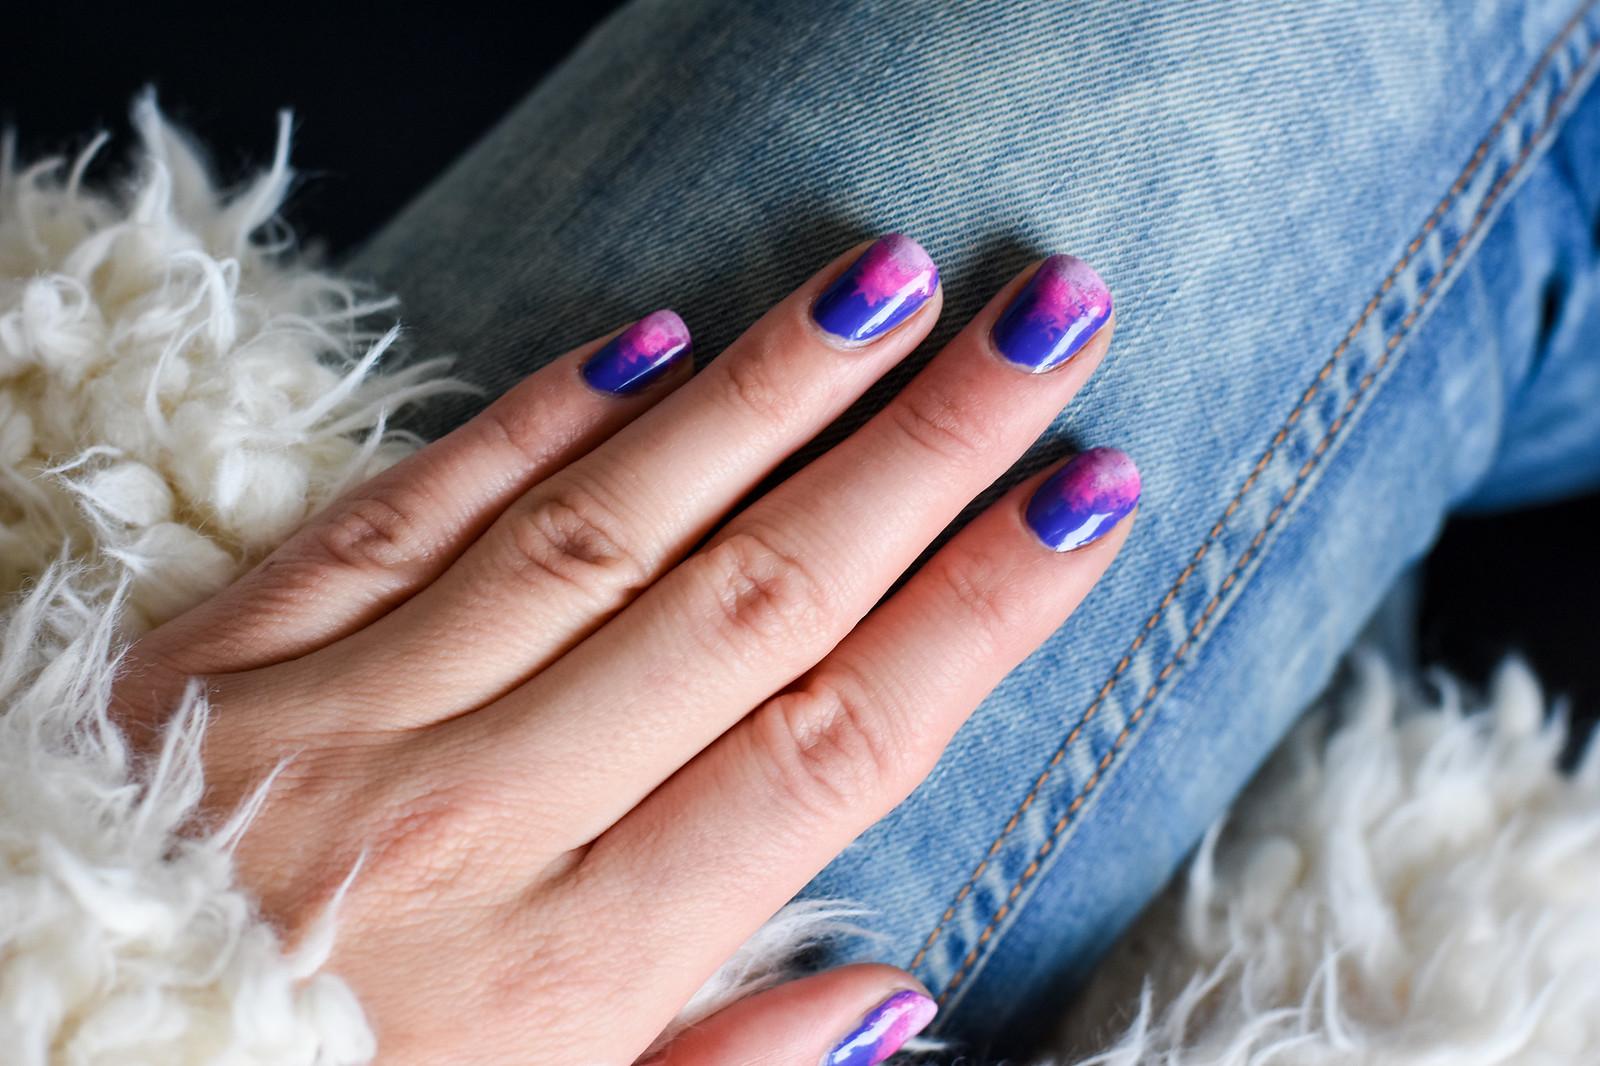 Galaxy inspired manicure